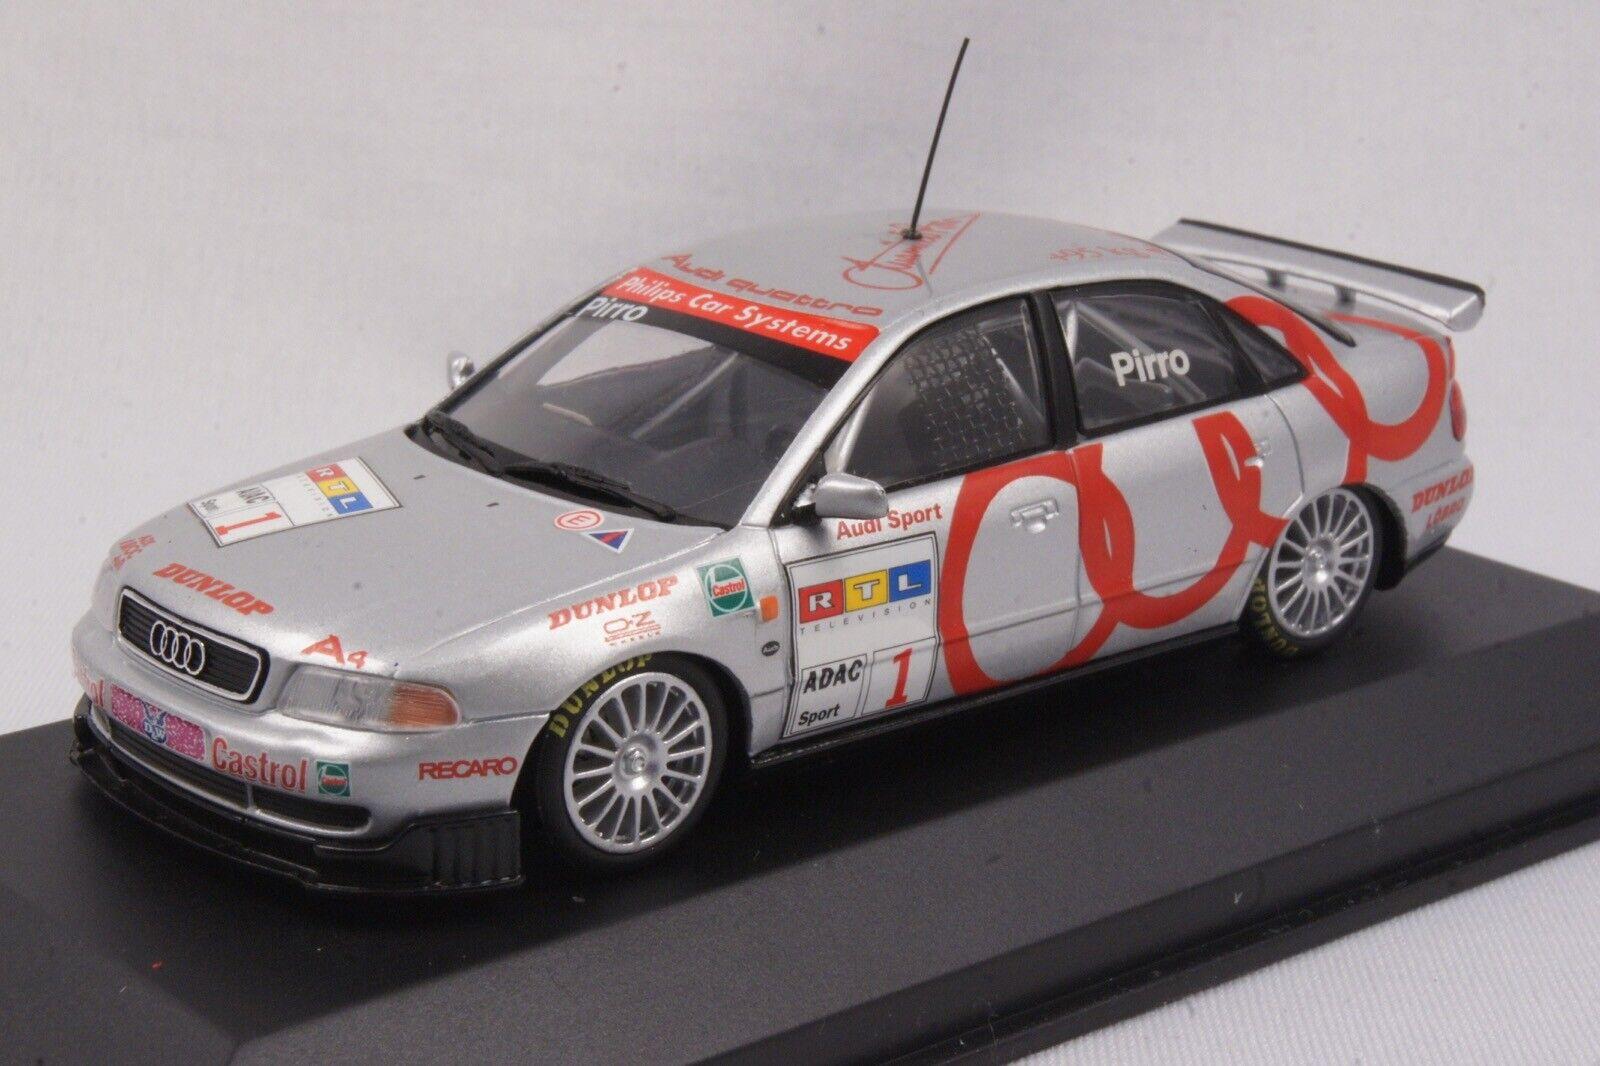 apresurado a ver Audi Minichamps 1 43 - - - a4 Quattro stw '97 Team a.z.k. Roc  1 Emanuele Pirro  bienvenido a elegir